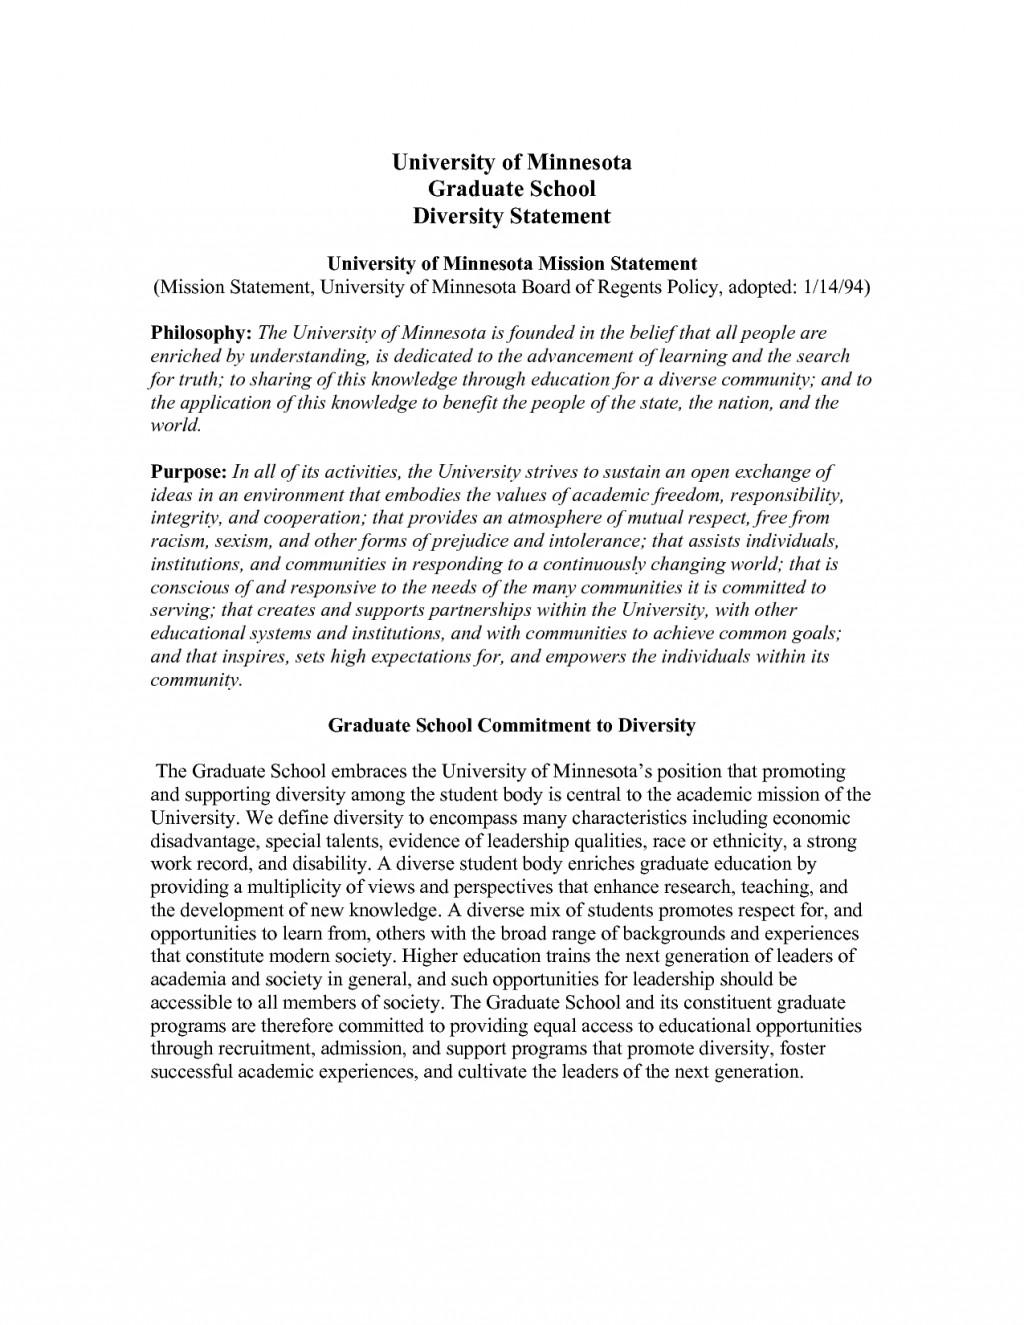 003 Diversity Essay Sample Fascinating Law School Large